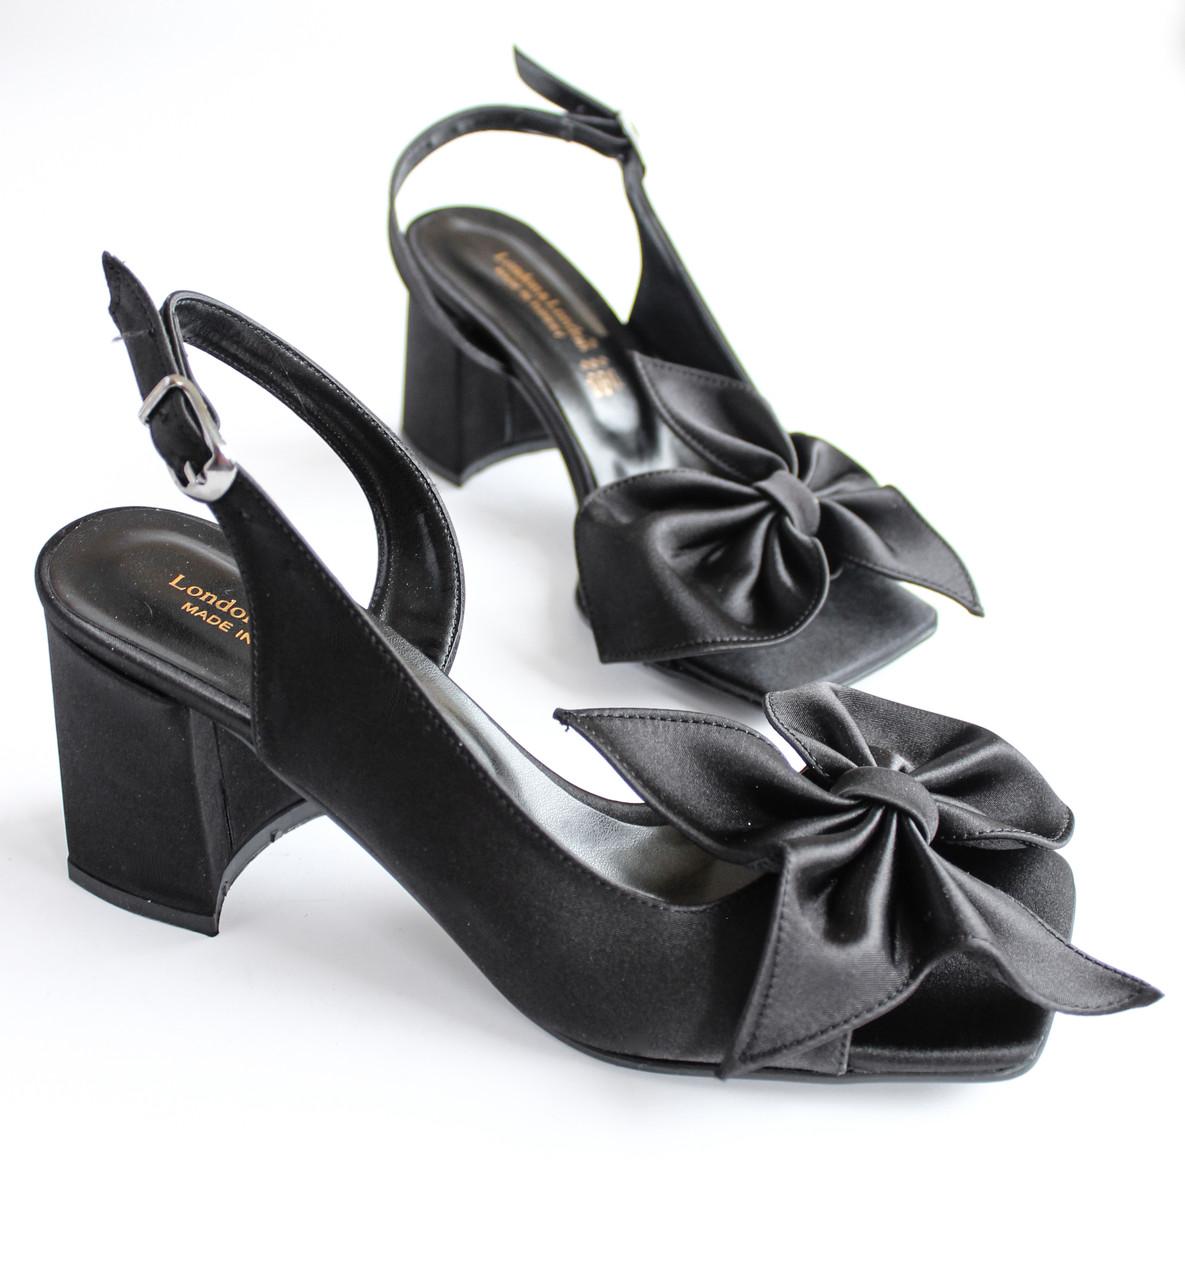 L&L / Женские босоножки на каблуке черные